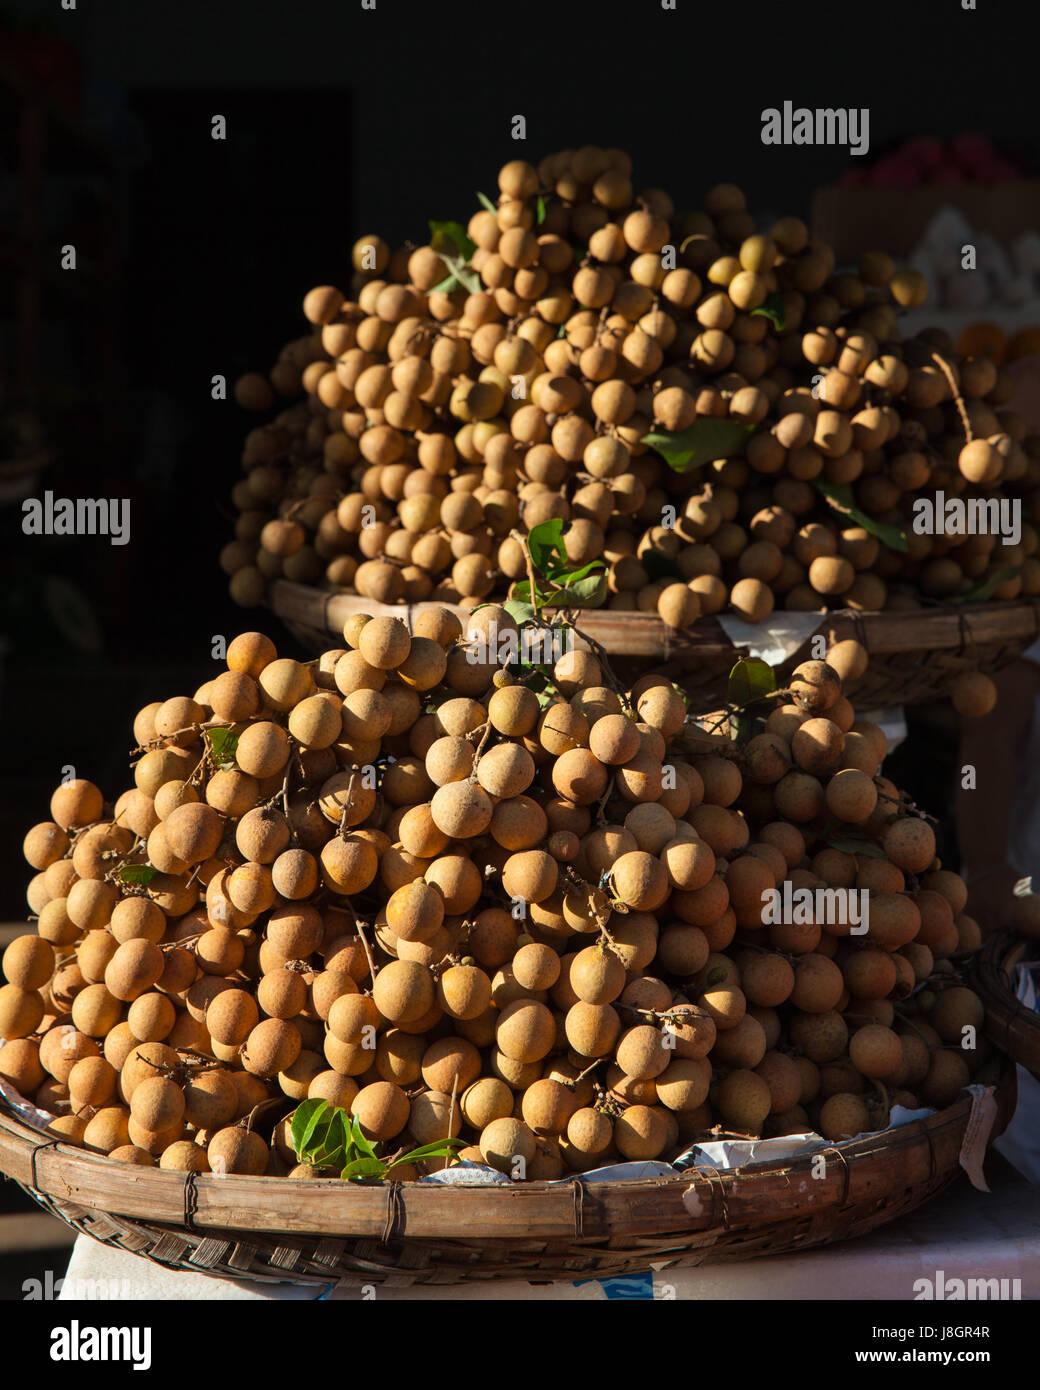 Baskets full of tropical longan fruit under morning light at the street market, Vietnam. - Stock Image